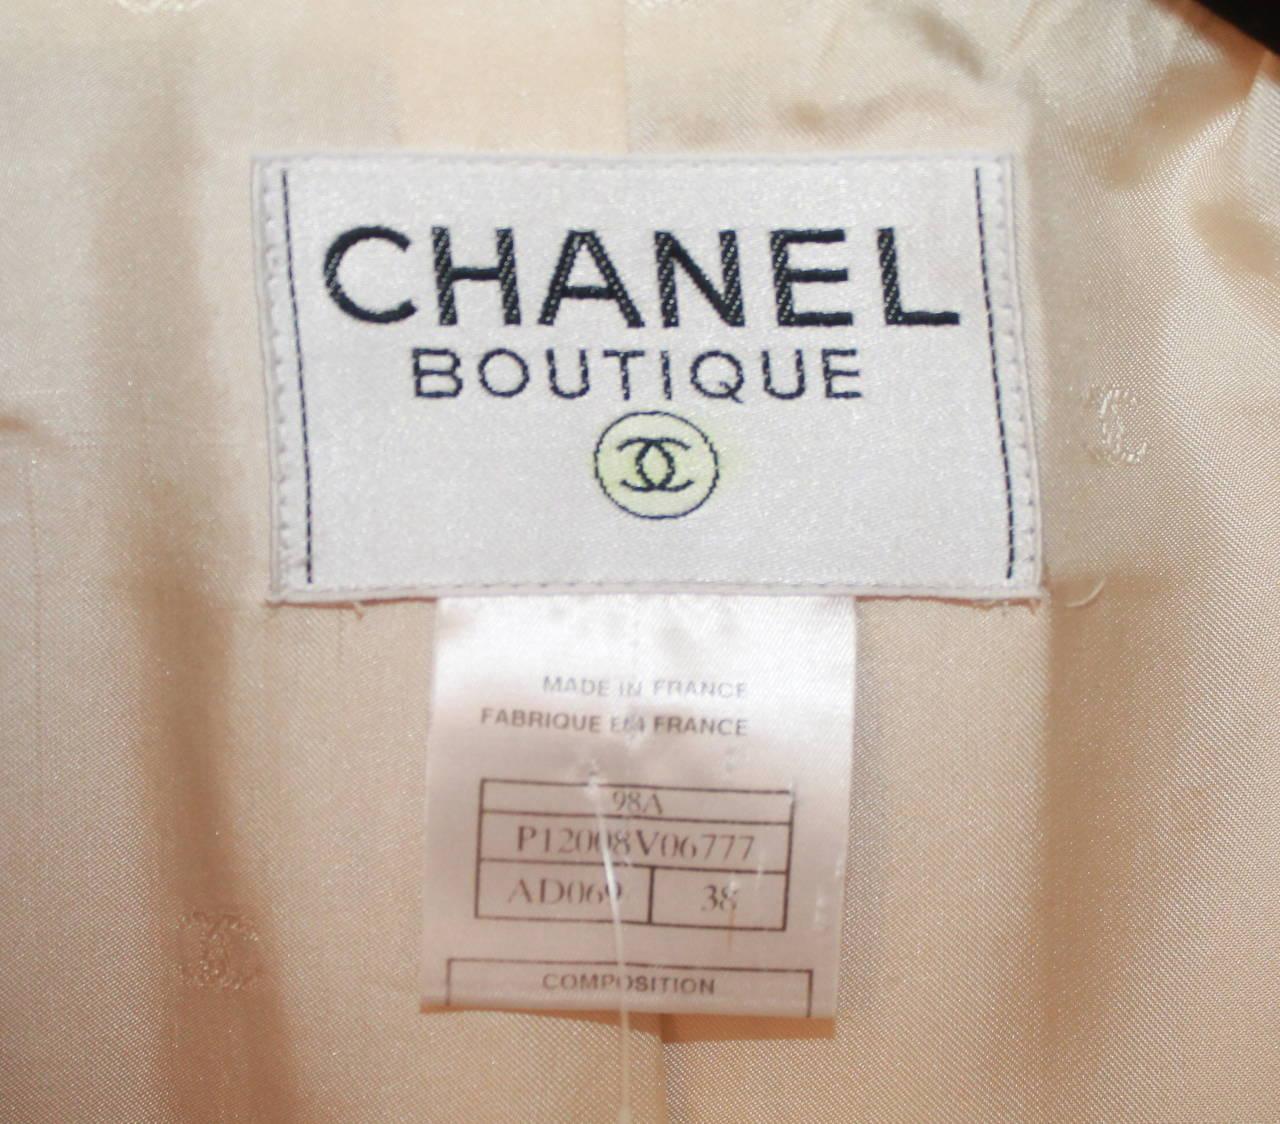 Chanel 1998 Vintage Creme Mohair & Wool Blend Jacket - 38 7